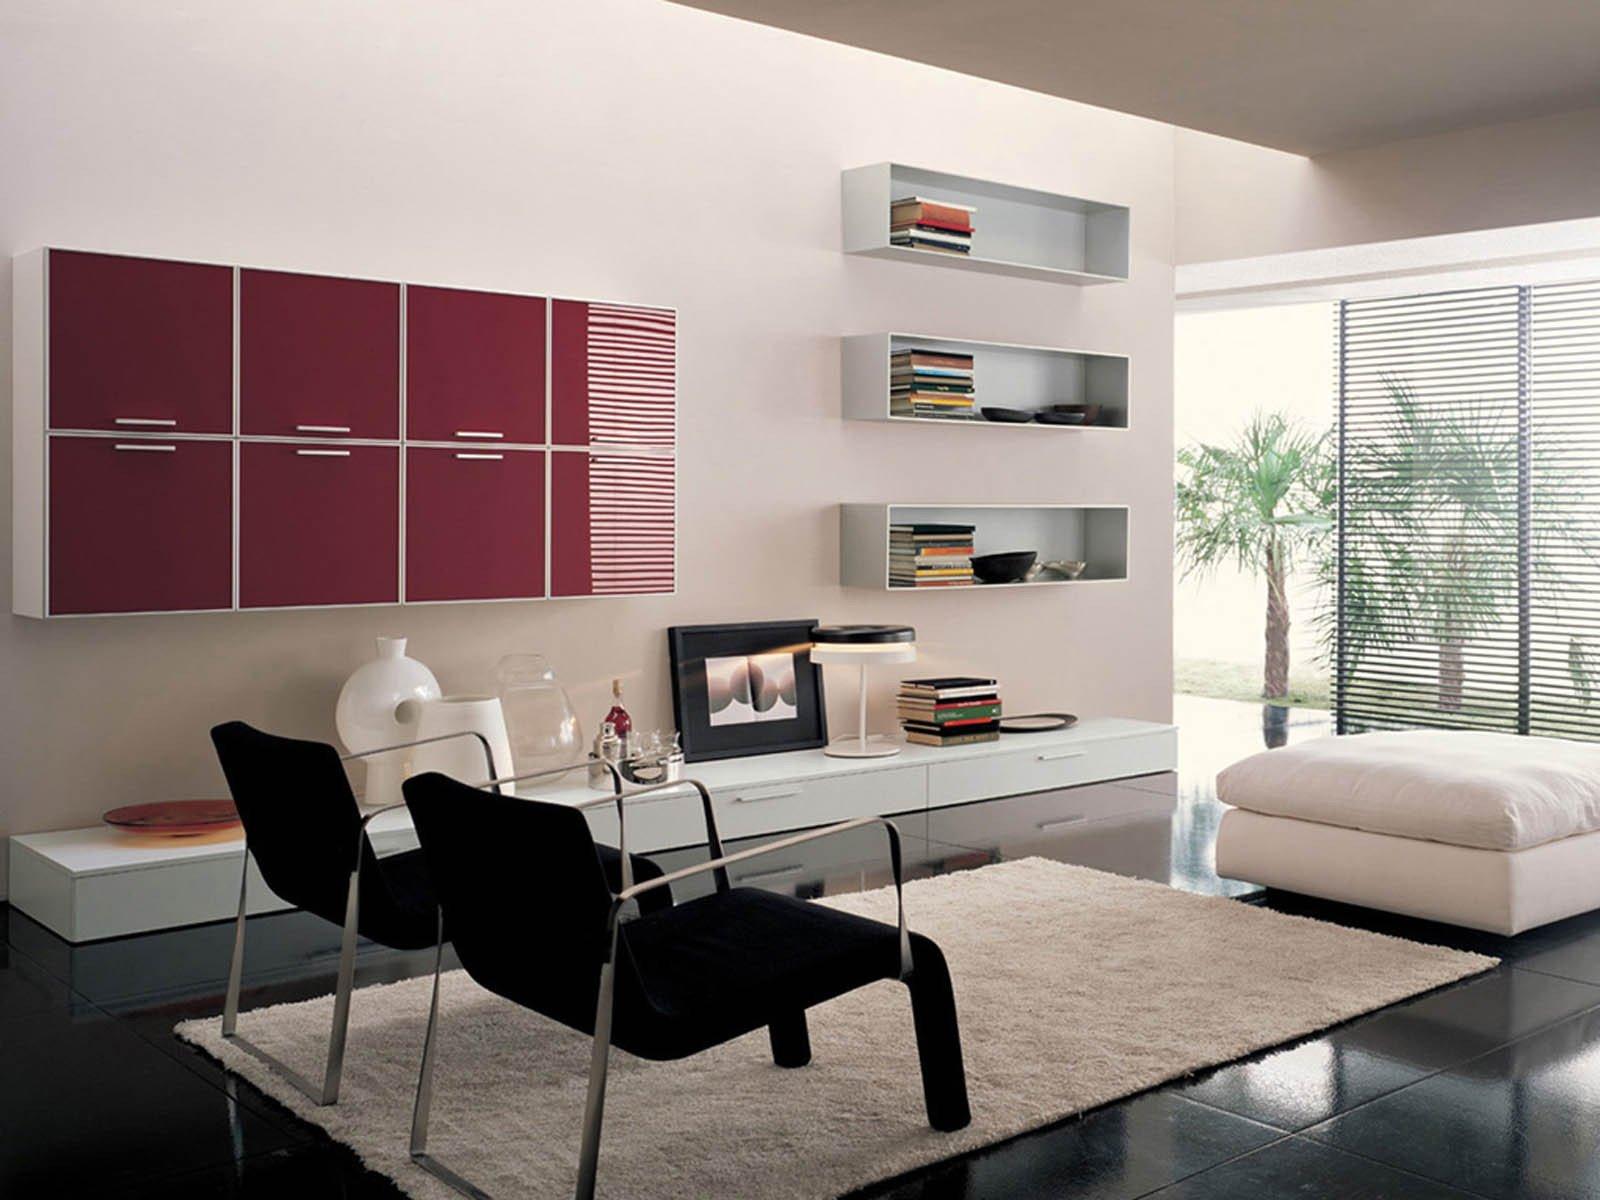 Contemporary Living Room Wallpaper Inspirational Wallpapers Modern Living Room S